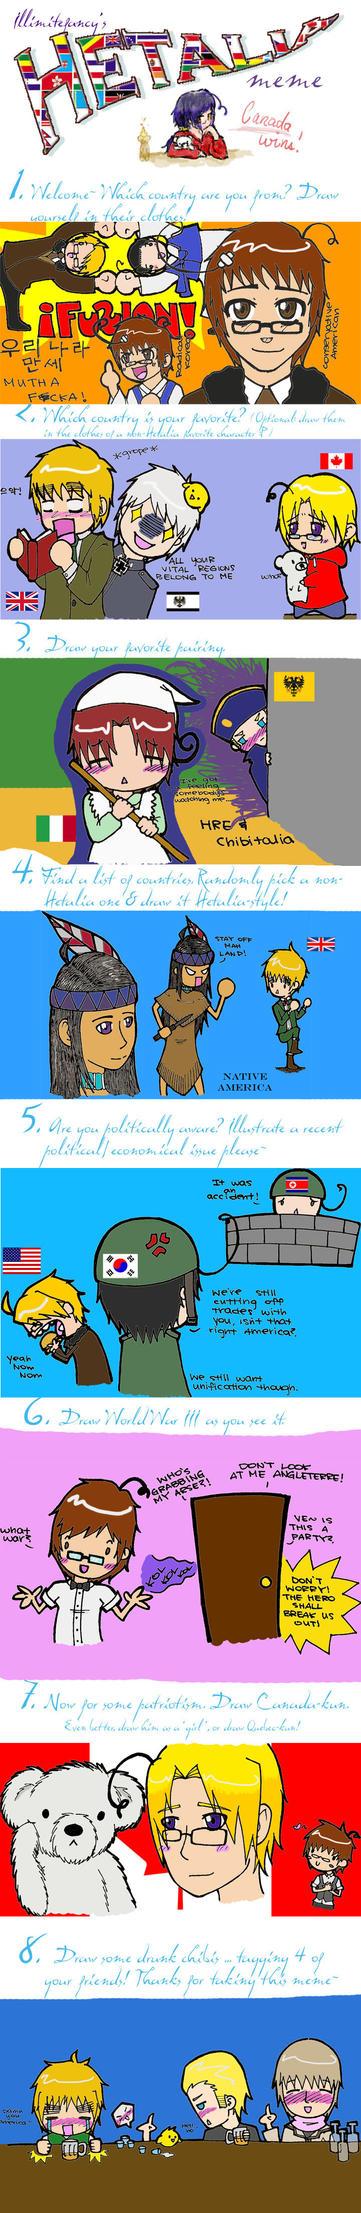 Another Hetalia Meme by karinchan3392